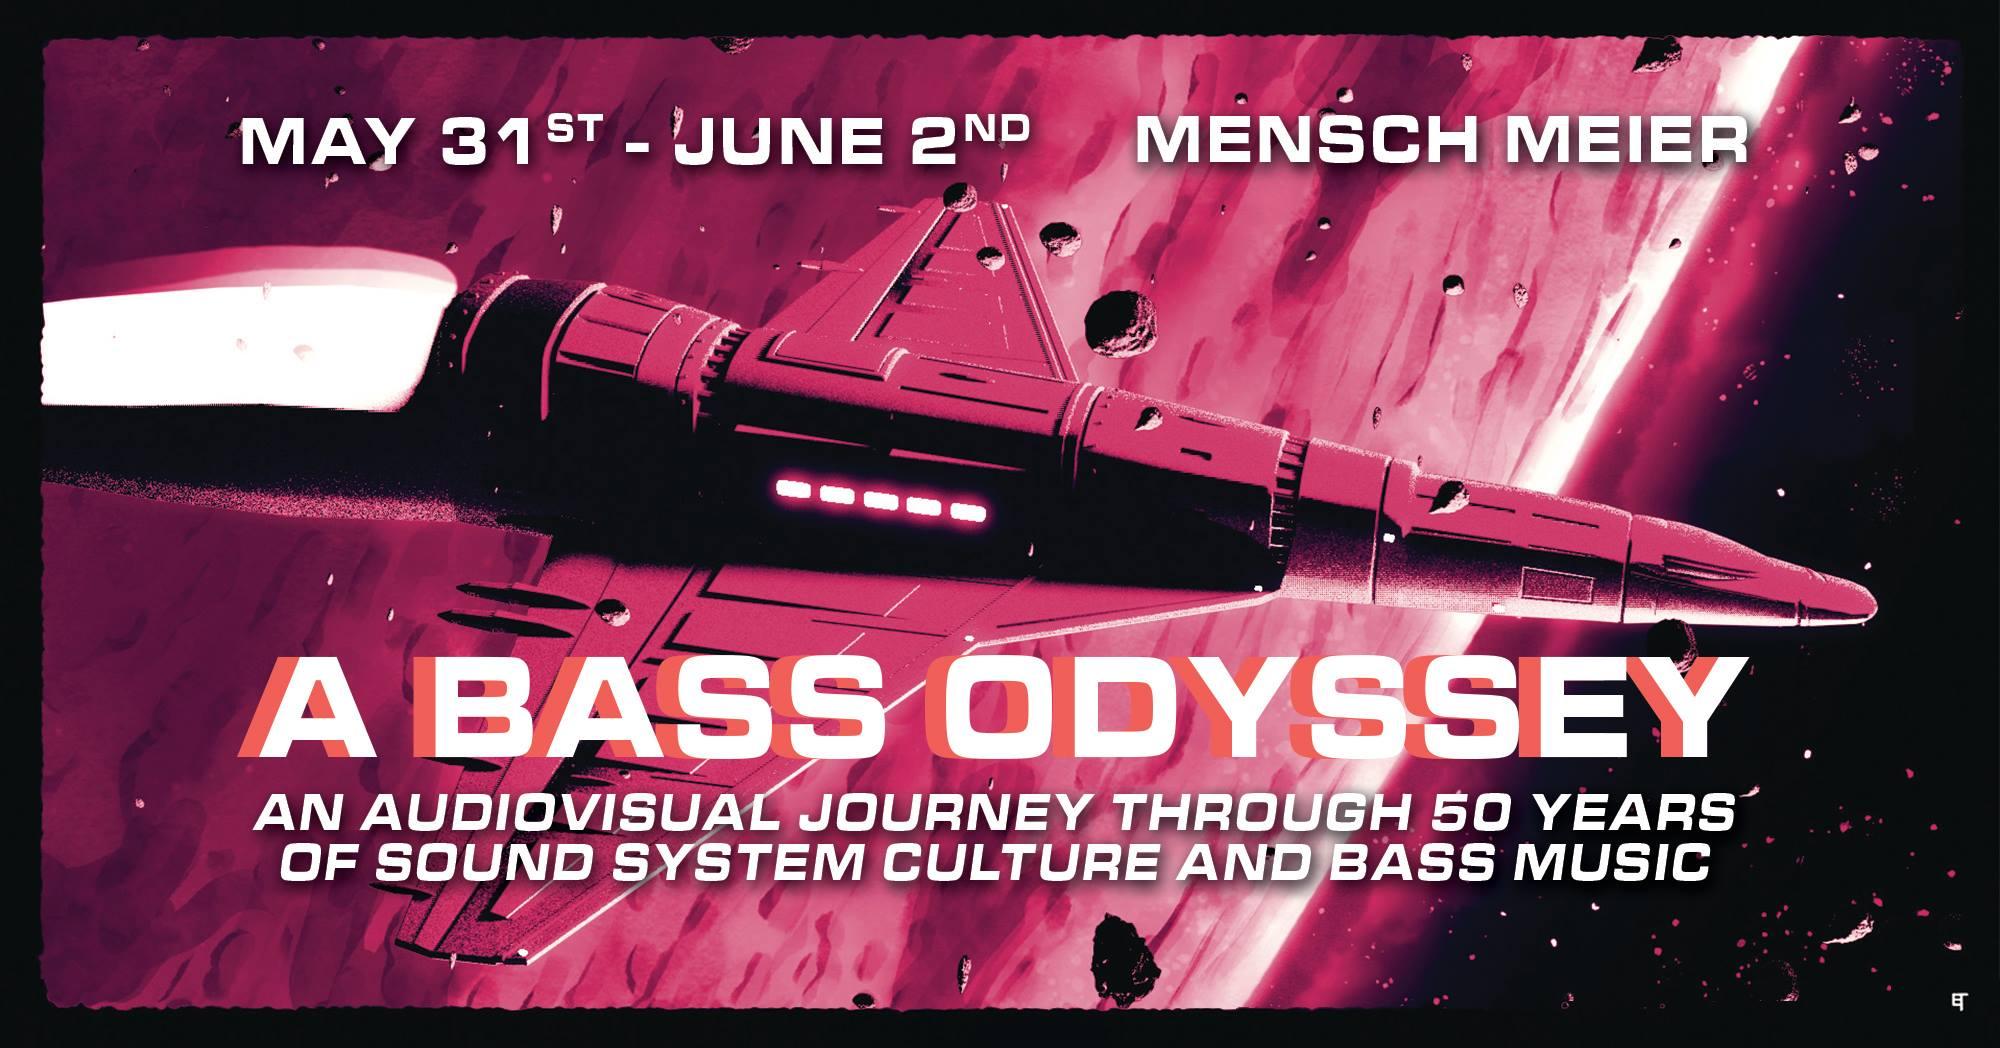 A Bass Odyssey Festival